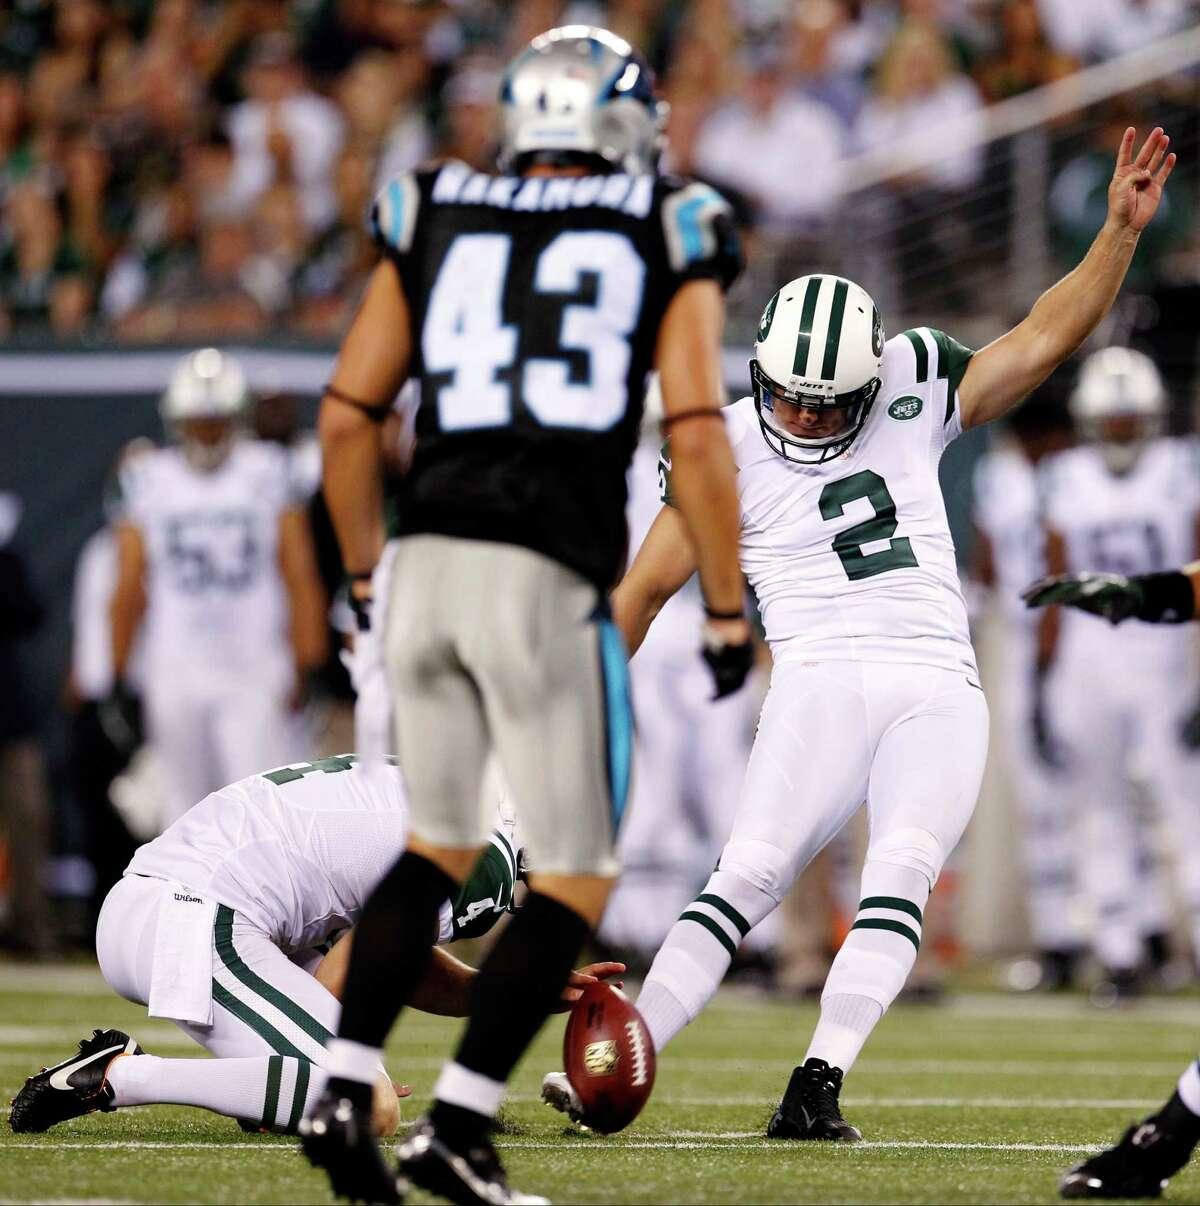 New York Jets kicker Nick Folk (2) kicks a field goal as Carolina Panthers' Haruki Nakamura (43) defends during the first half of a preseason NFL football game, Sunday, Aug. 26, 2012, in East Rutherford, N.J. (AP Photo/Julio Cortez)